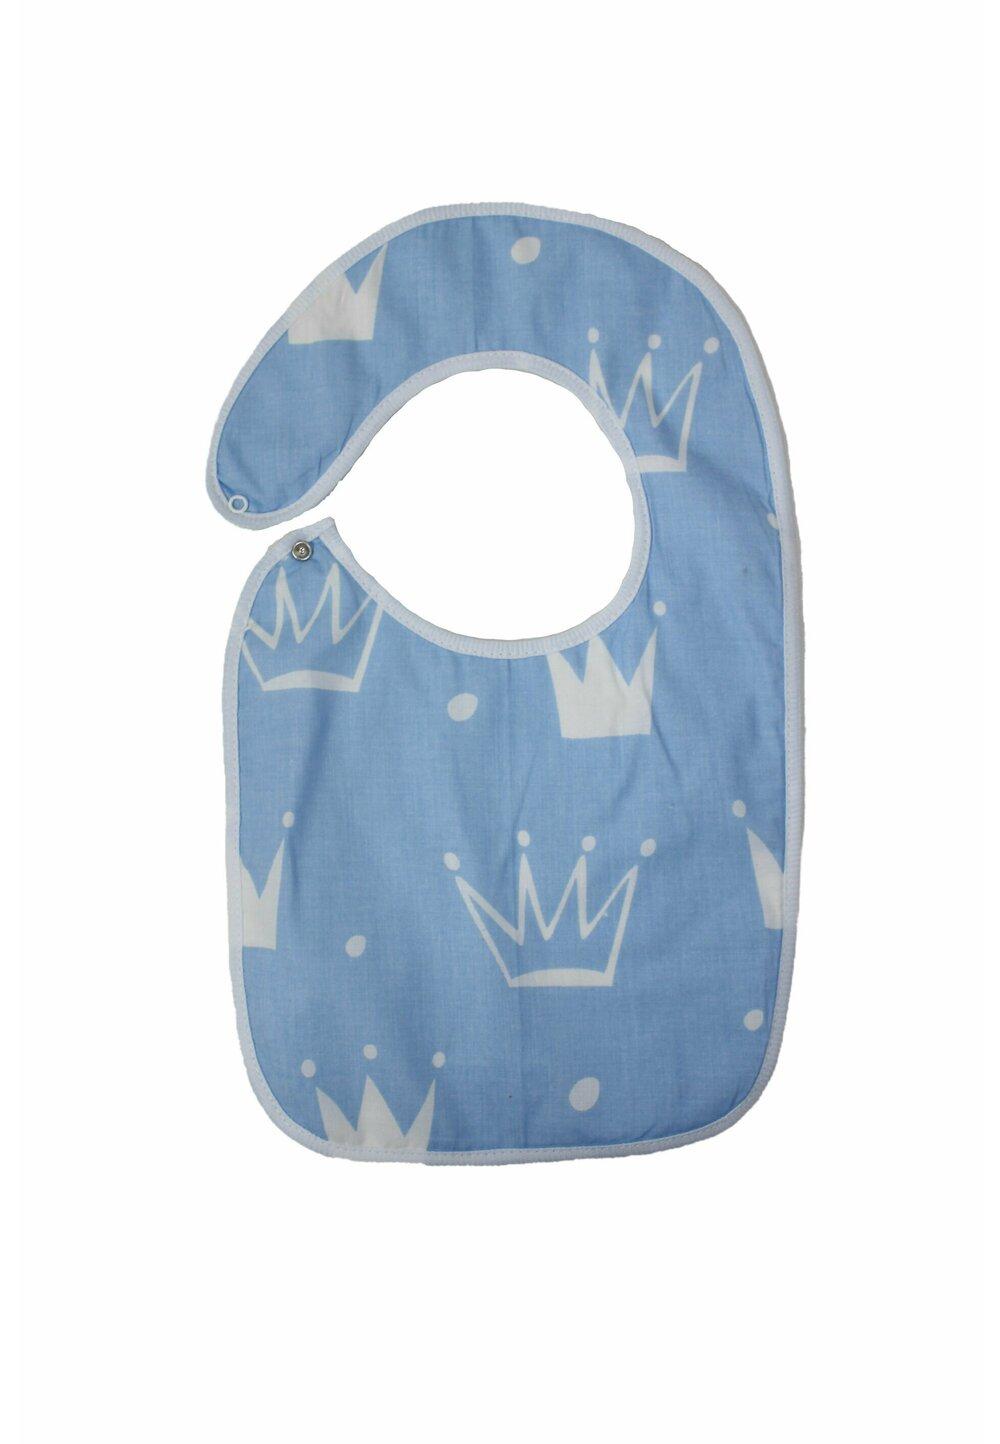 Baveta bebe, coronite albastre, 6-12 luni imagine